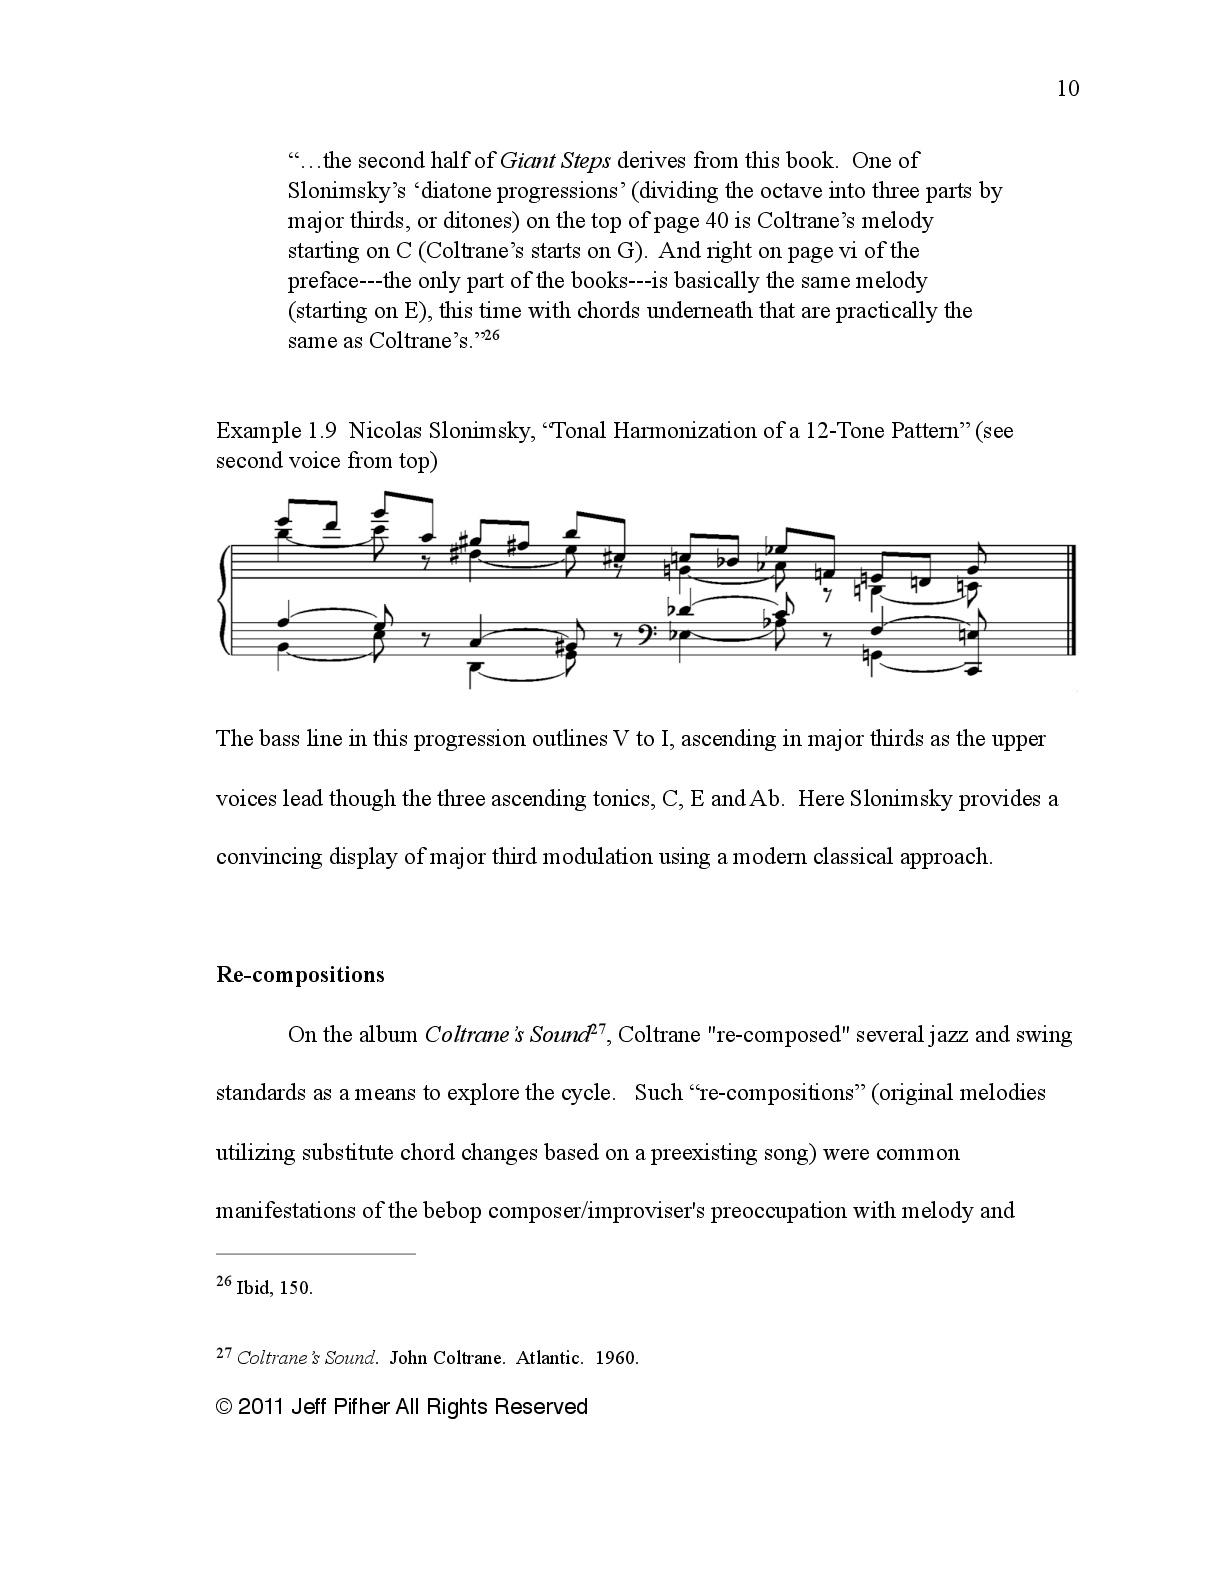 Jeff-Pifher-Academic-Series-Coltrane-Cycles-010.jpg